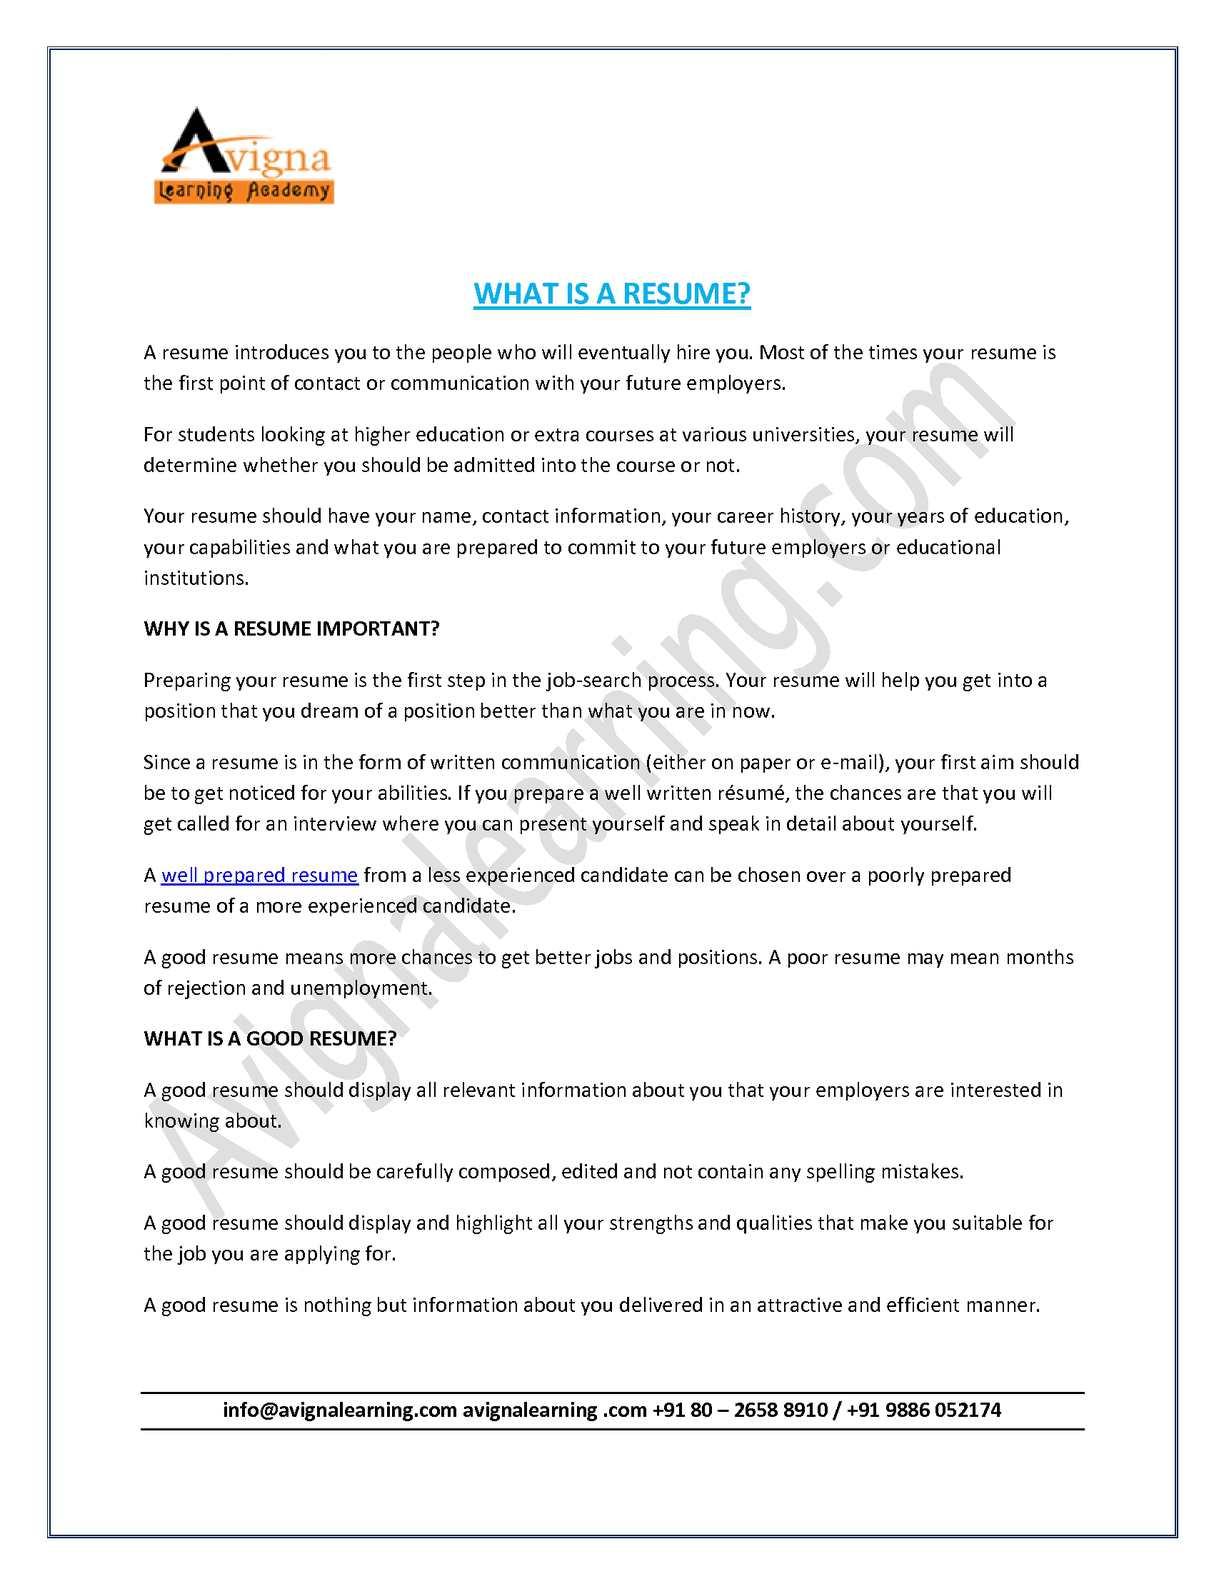 calaméo professional resume writing services